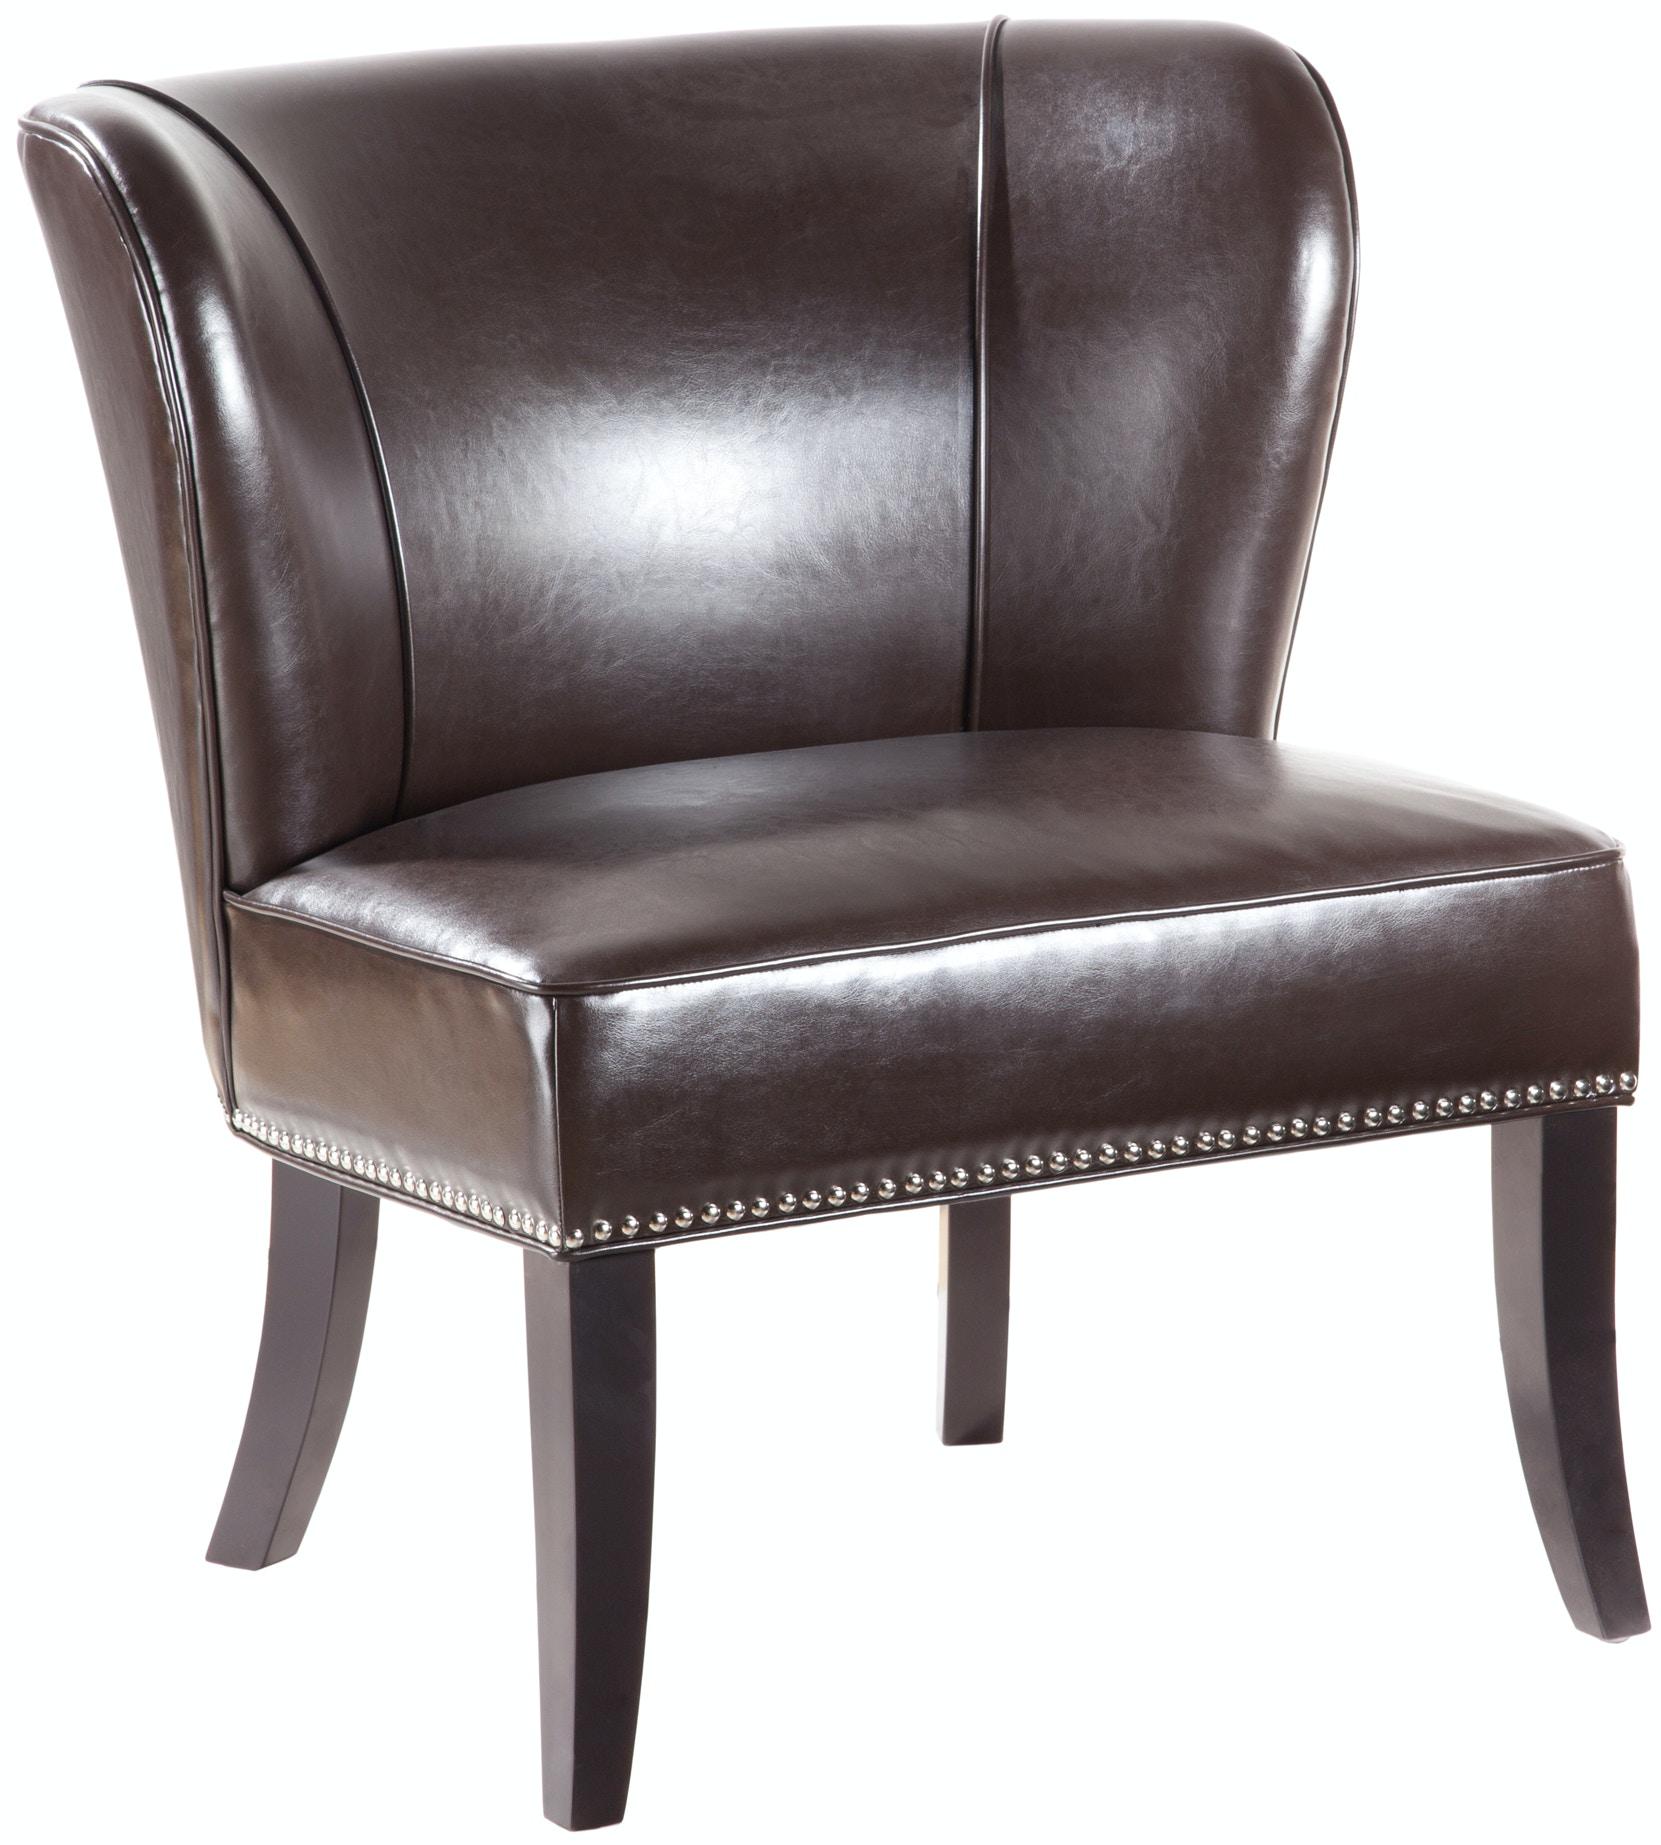 Hilton Armless Accent Chair   BROWN ST:496494